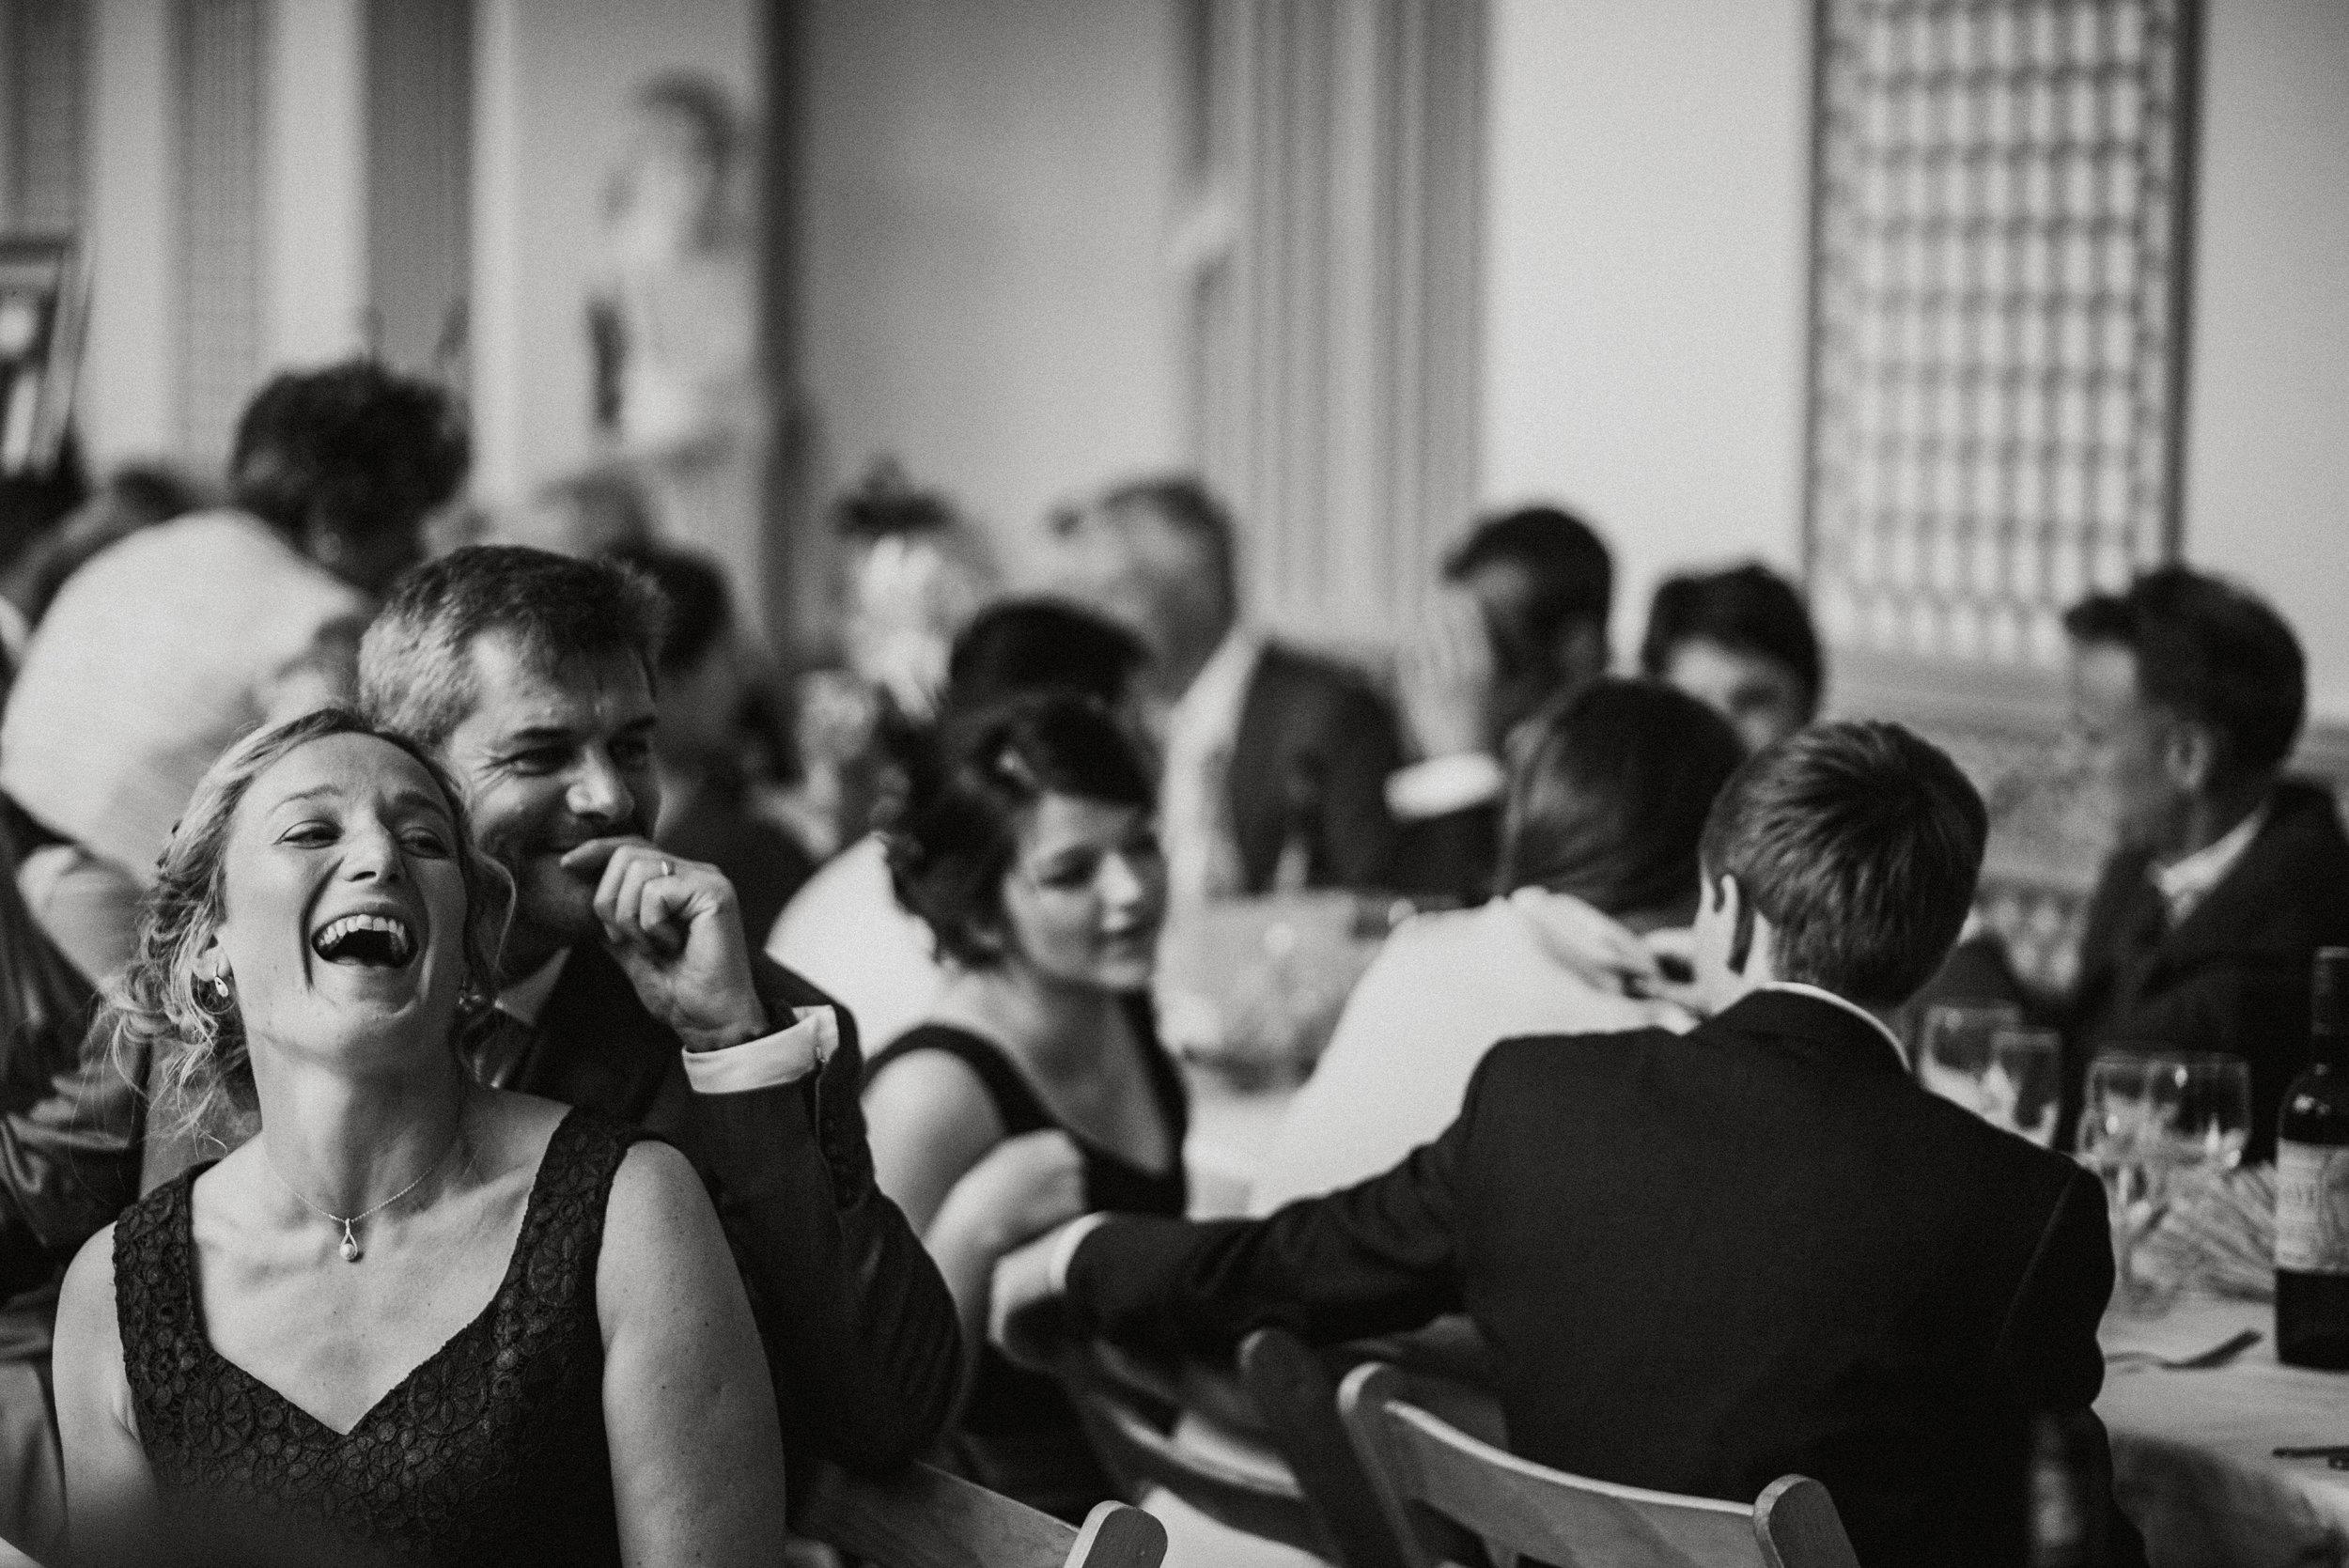 port-eliot-wedding-photographer-64.jpg